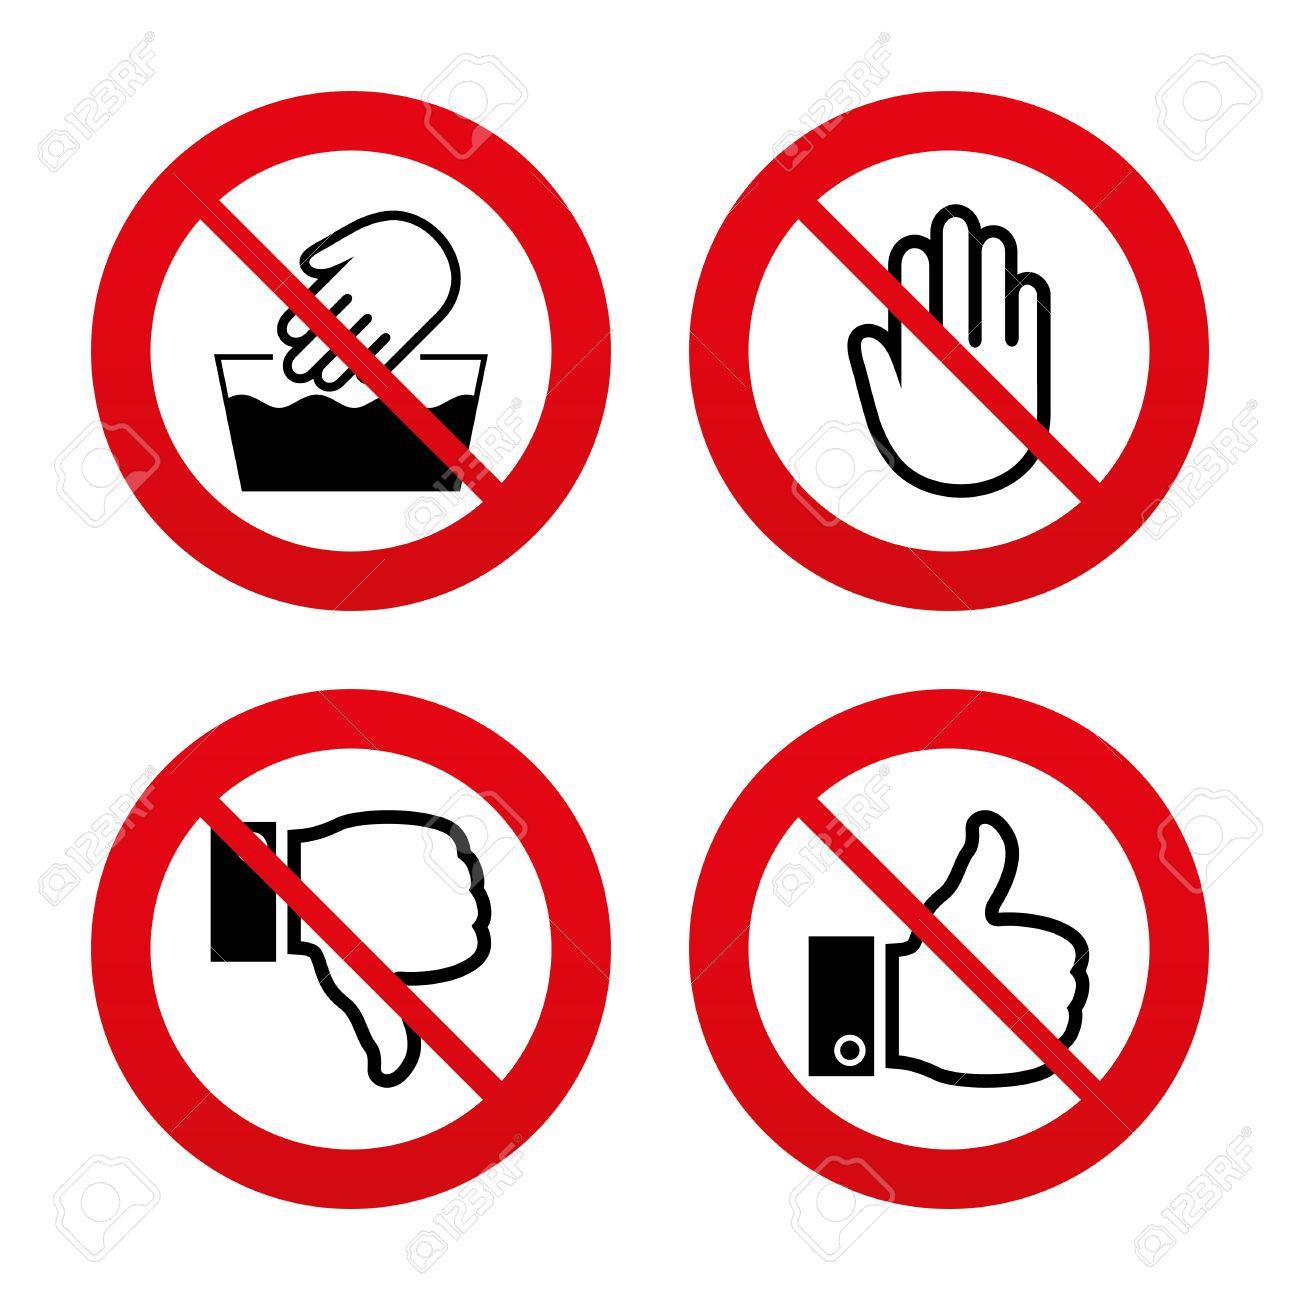 No ban or stop signs hand icons like and dislike thumb up no ban or stop signs hand icons like and dislike thumb up symbols buycottarizona